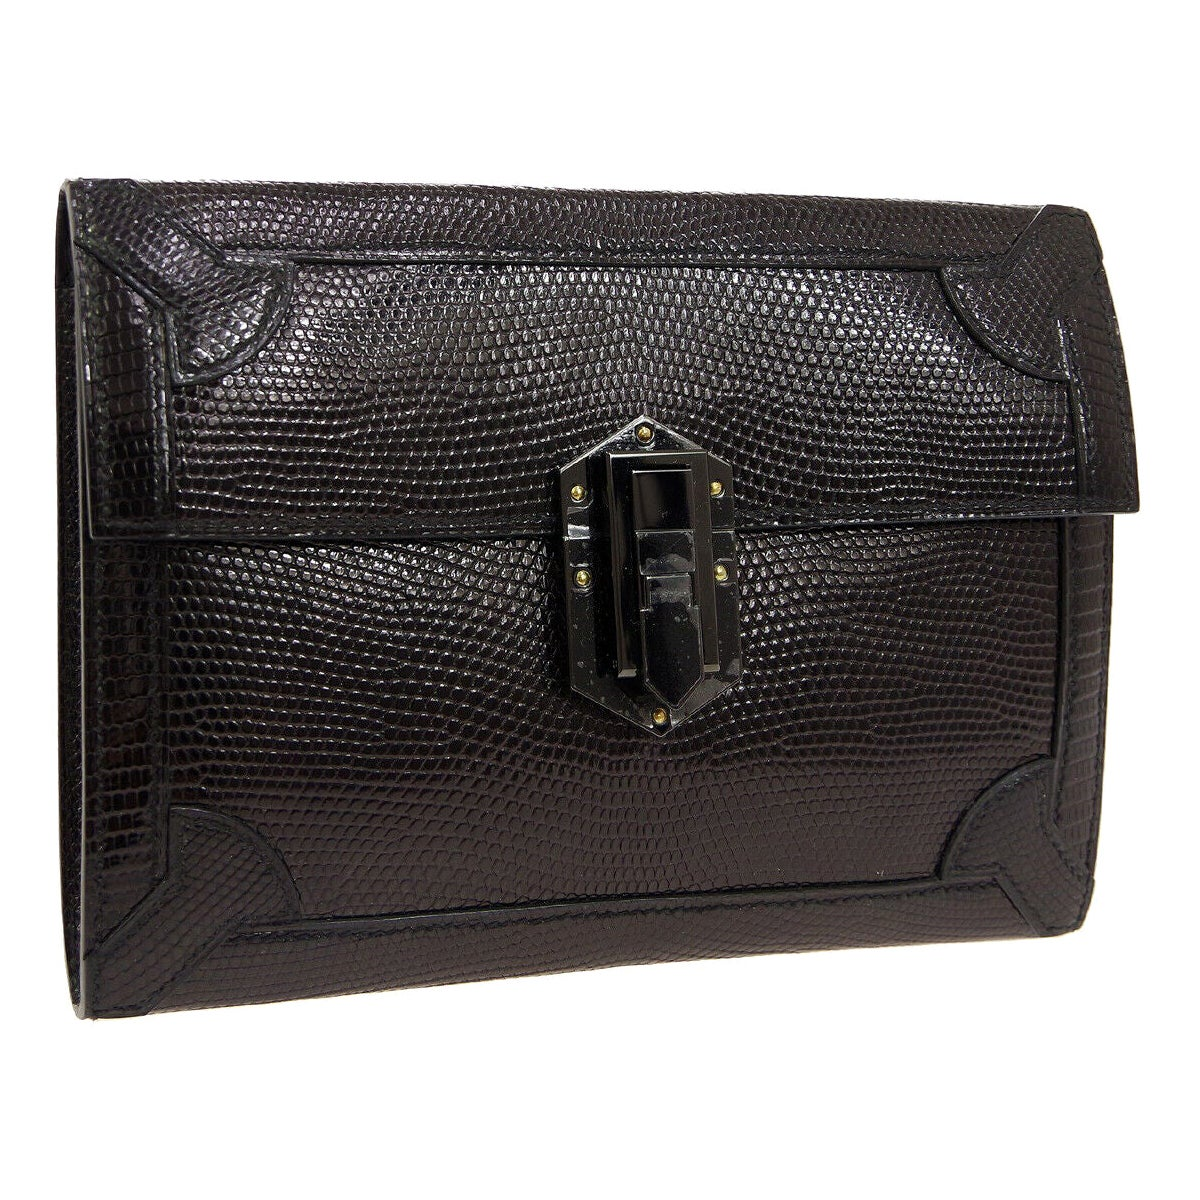 Hermes Black Lizard Exotic Leather Envelope Evening Clutch Bag in Box